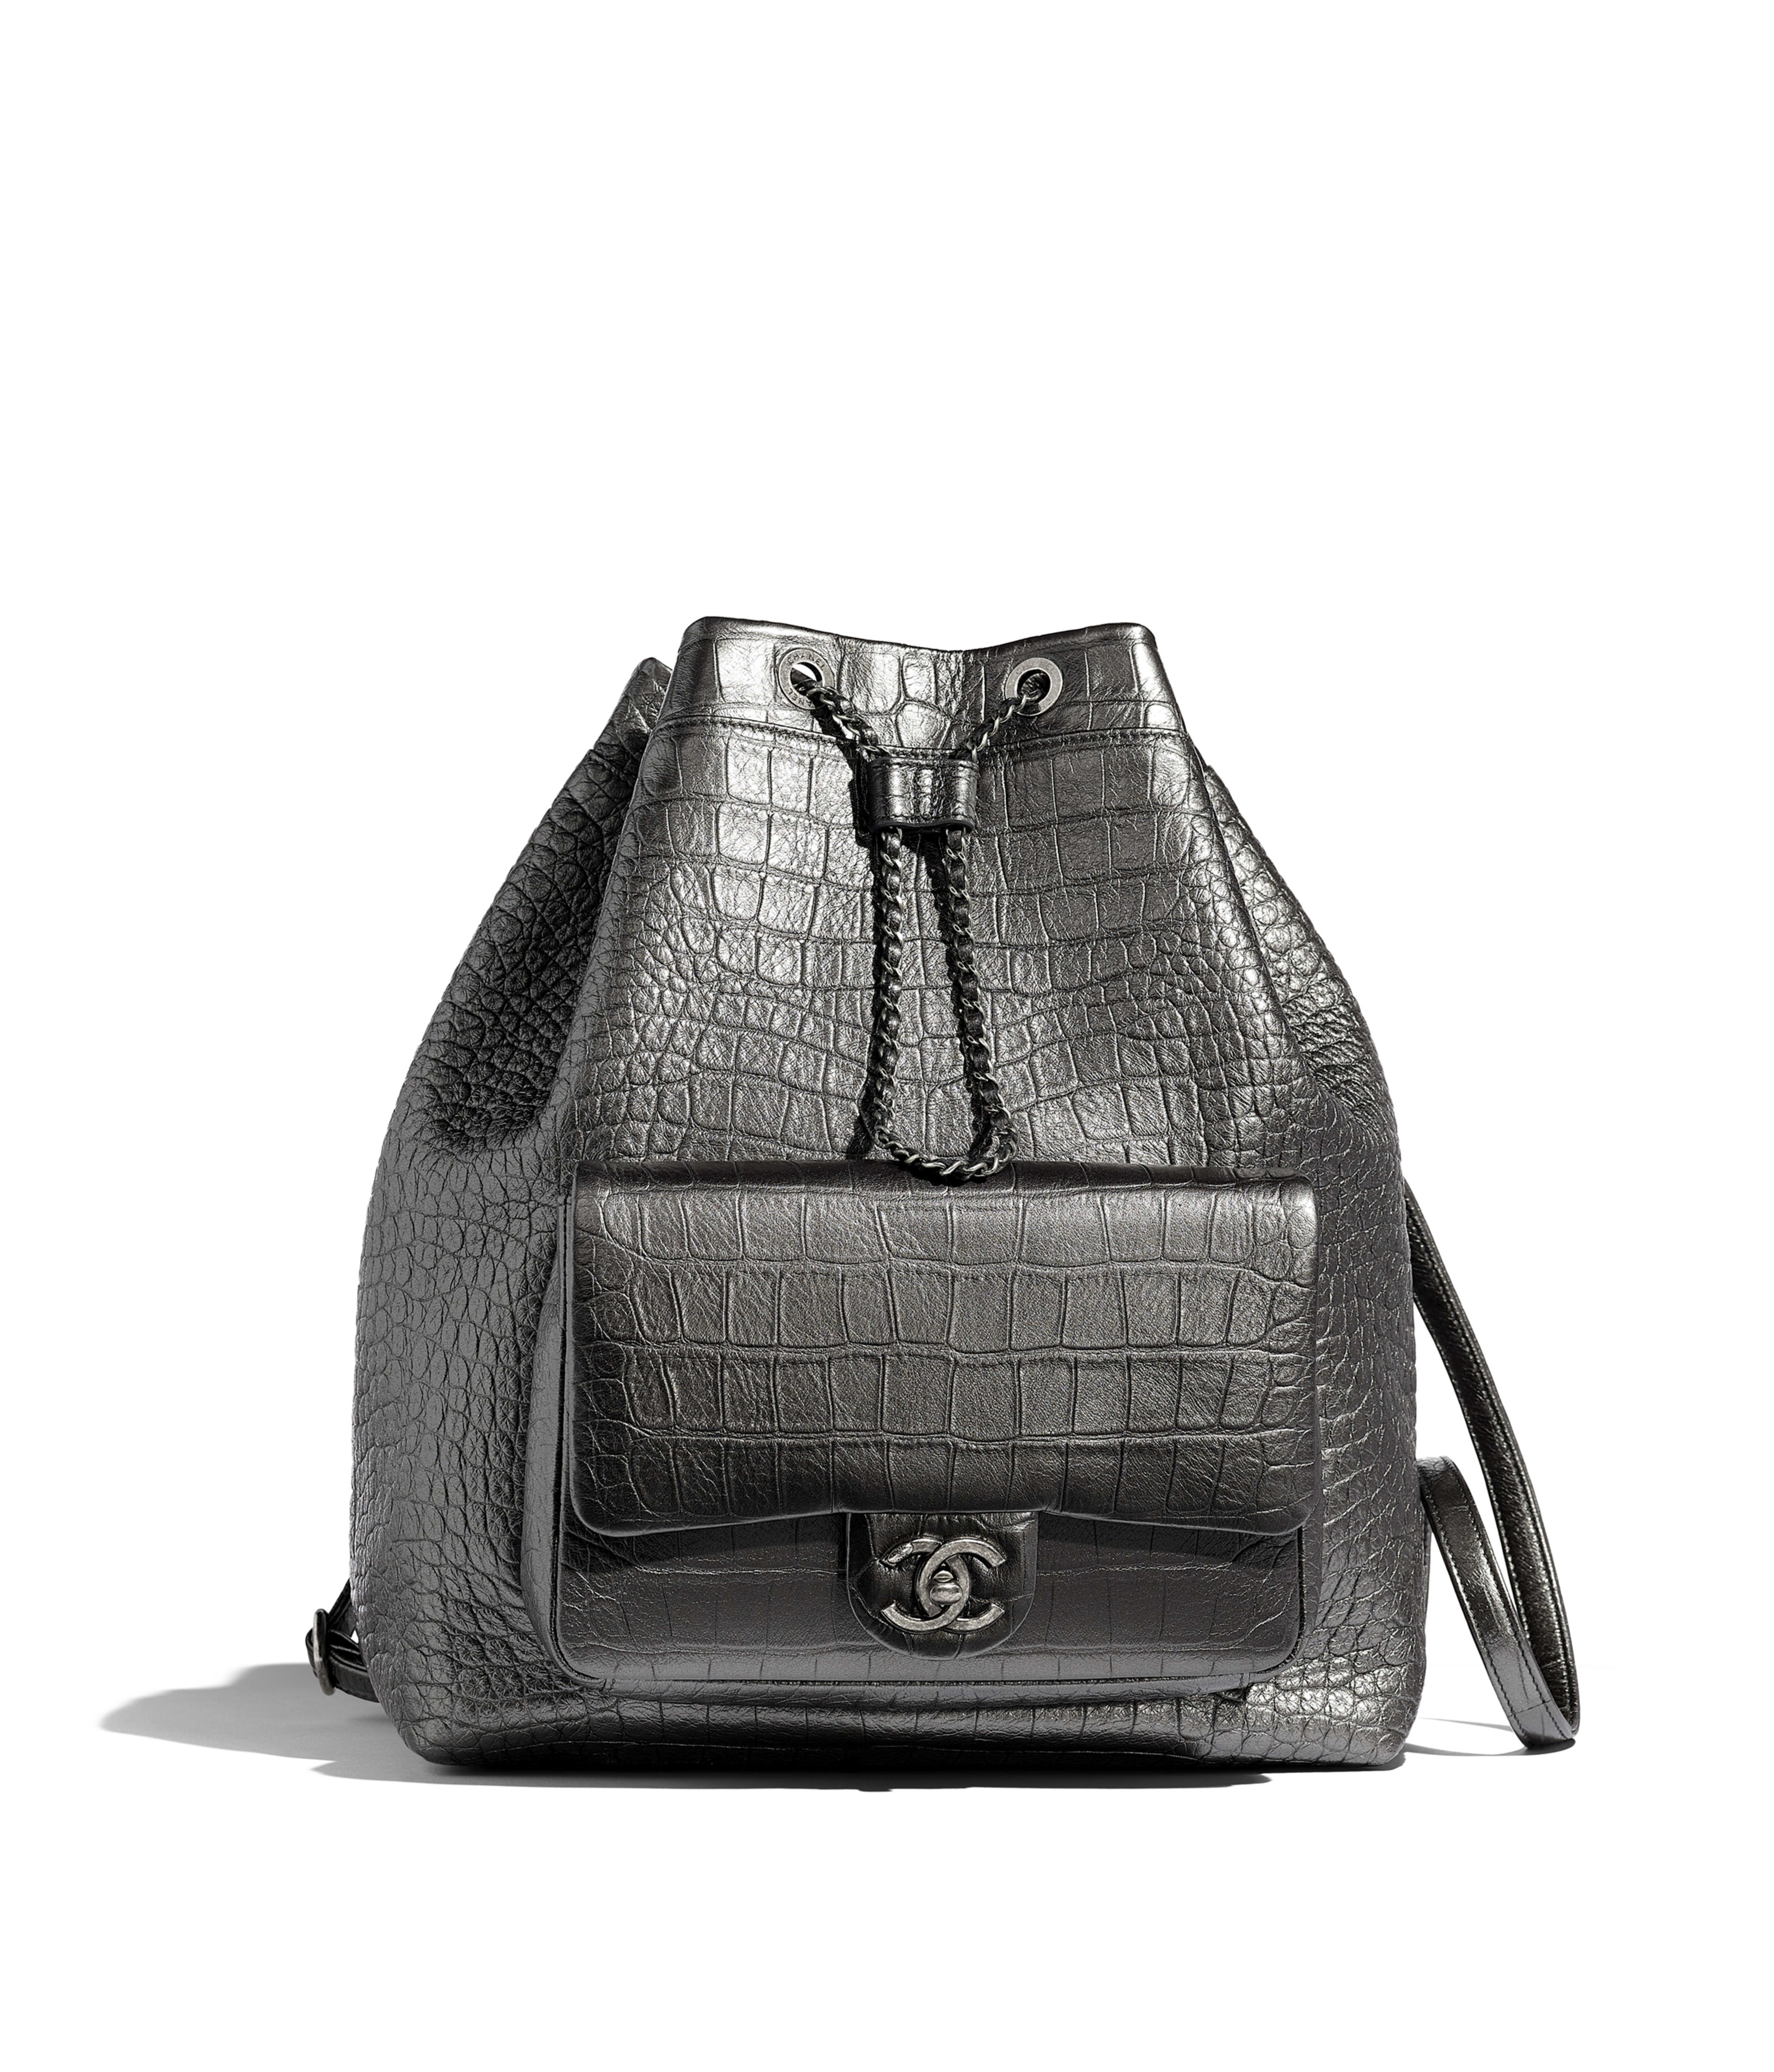 64ed91fbf Large Backpack Metallic Crocodile Embossed Calfskin & Ruthenium-Finish  Metal, Silver Ref. AS0800B00784N4776